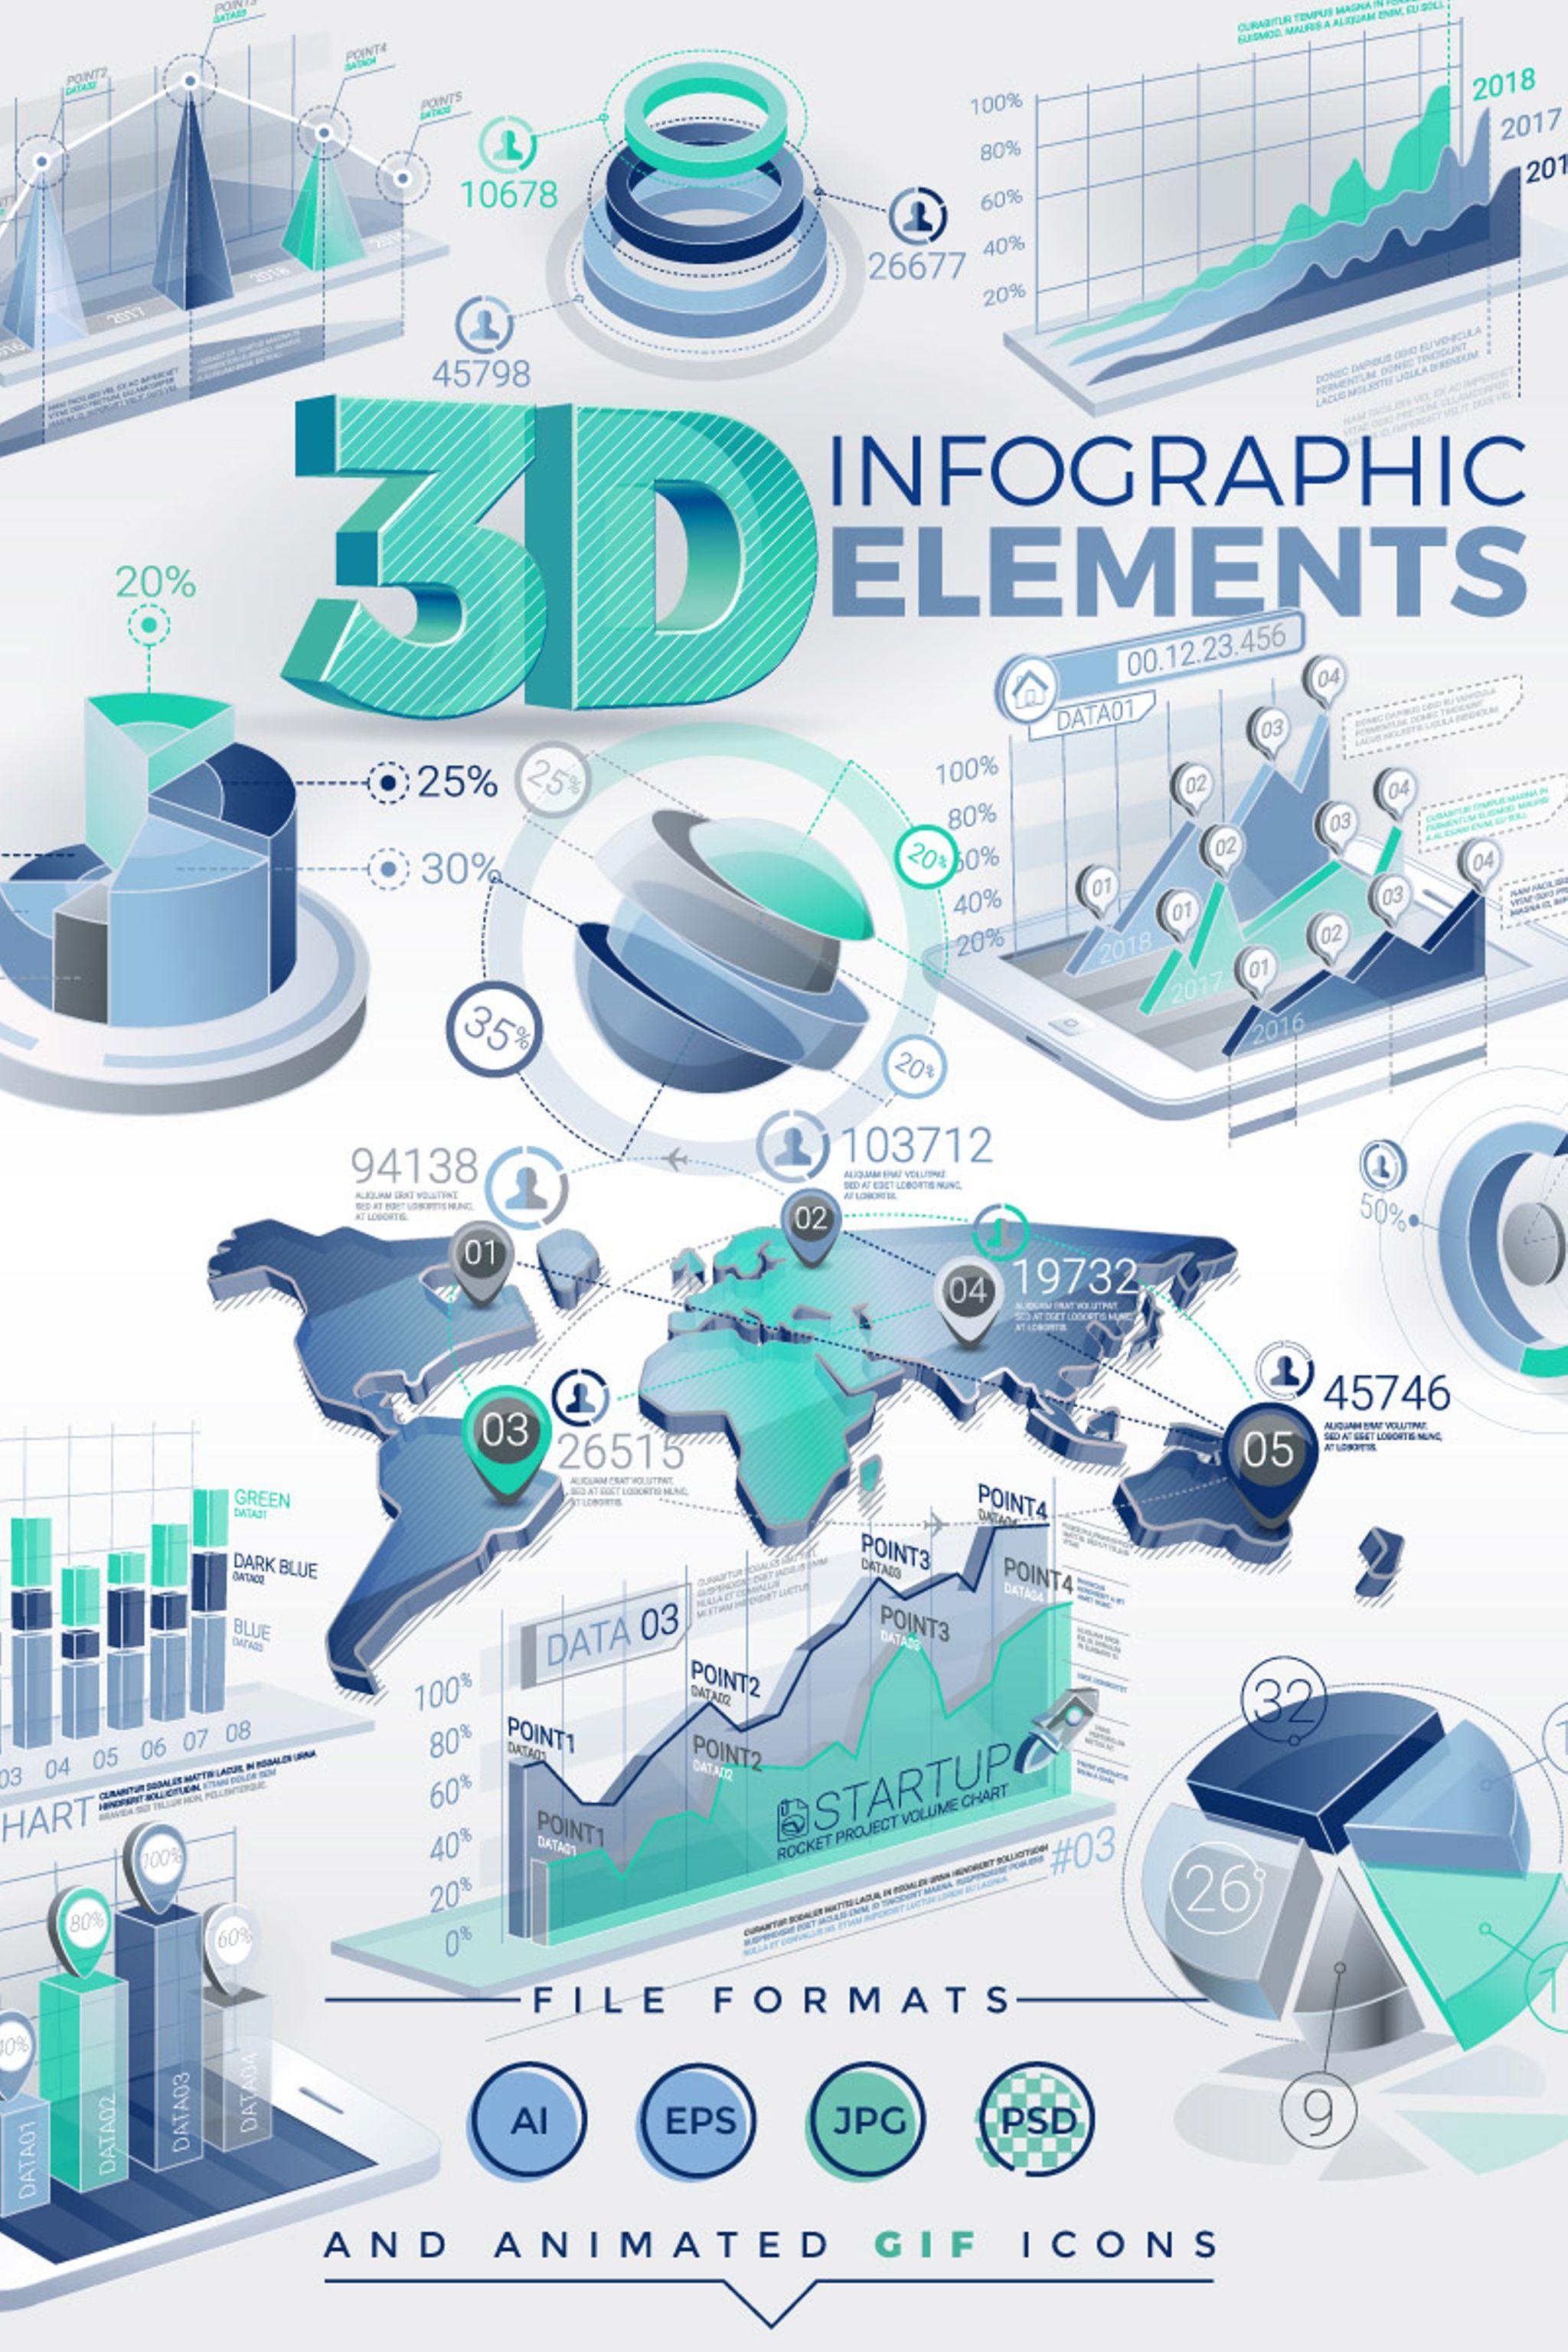 Elementy infografiki 3D #67295 - zrzut ekranu